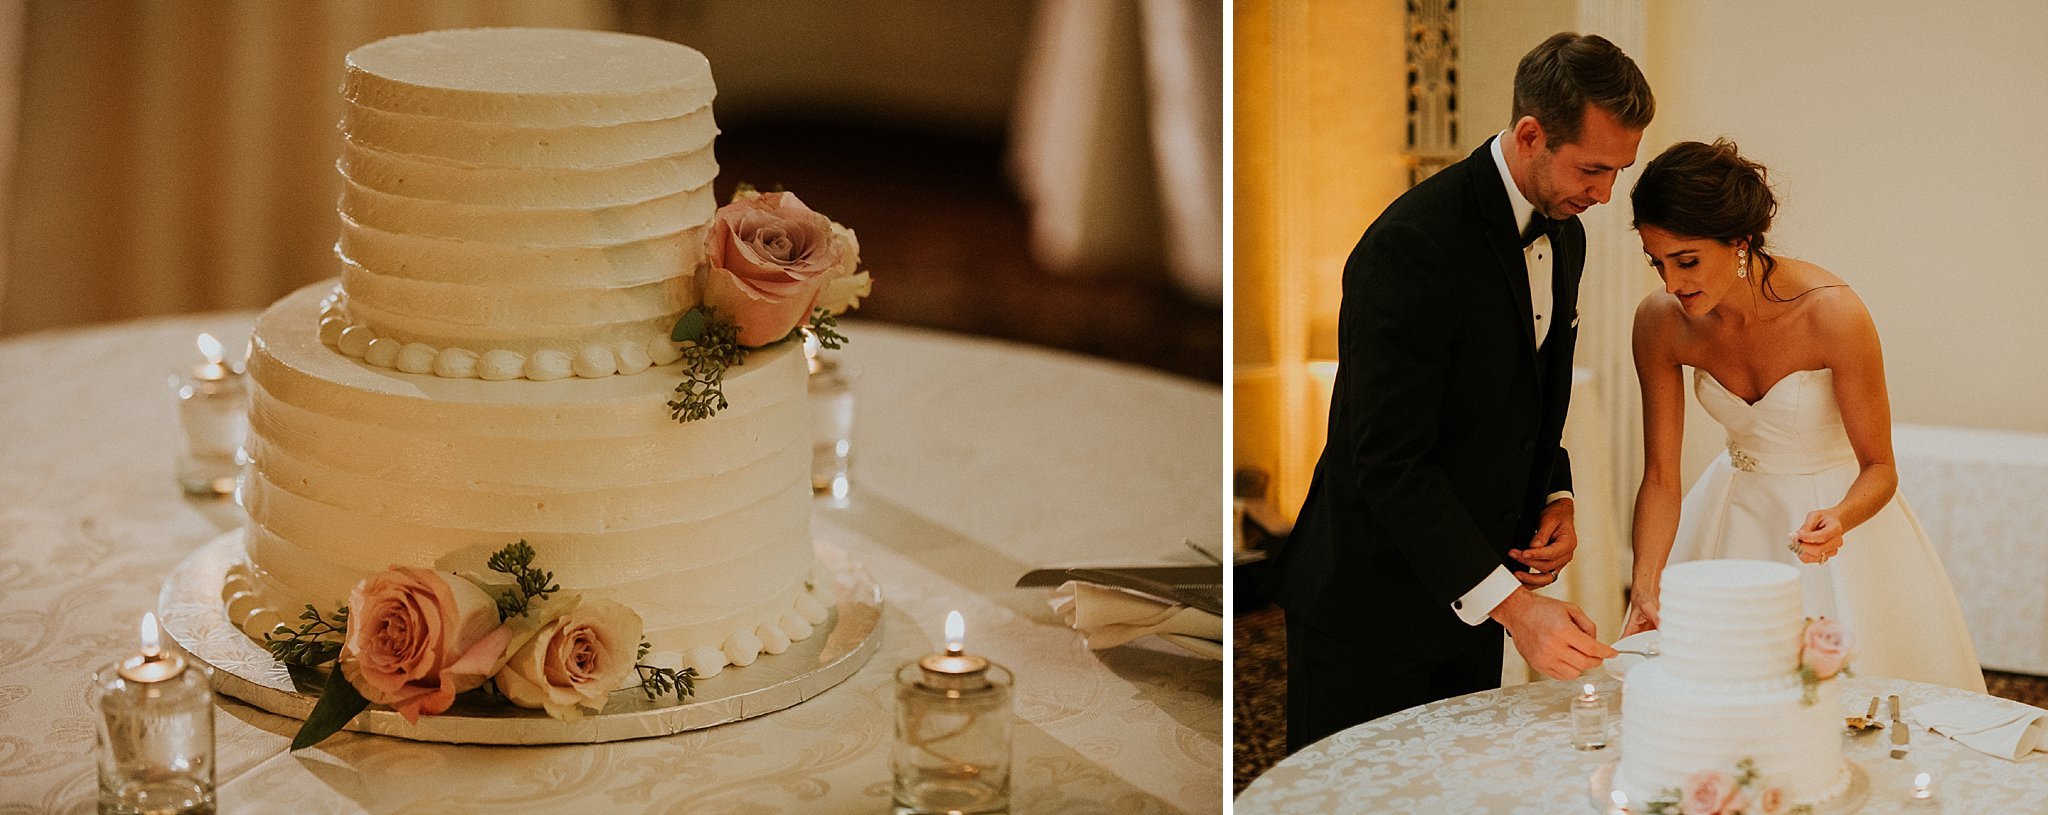 Matt-Lauren_St-Marys_Hilton-City-Center-Milwaukee-Wedding_liller-photo_0068.jpg